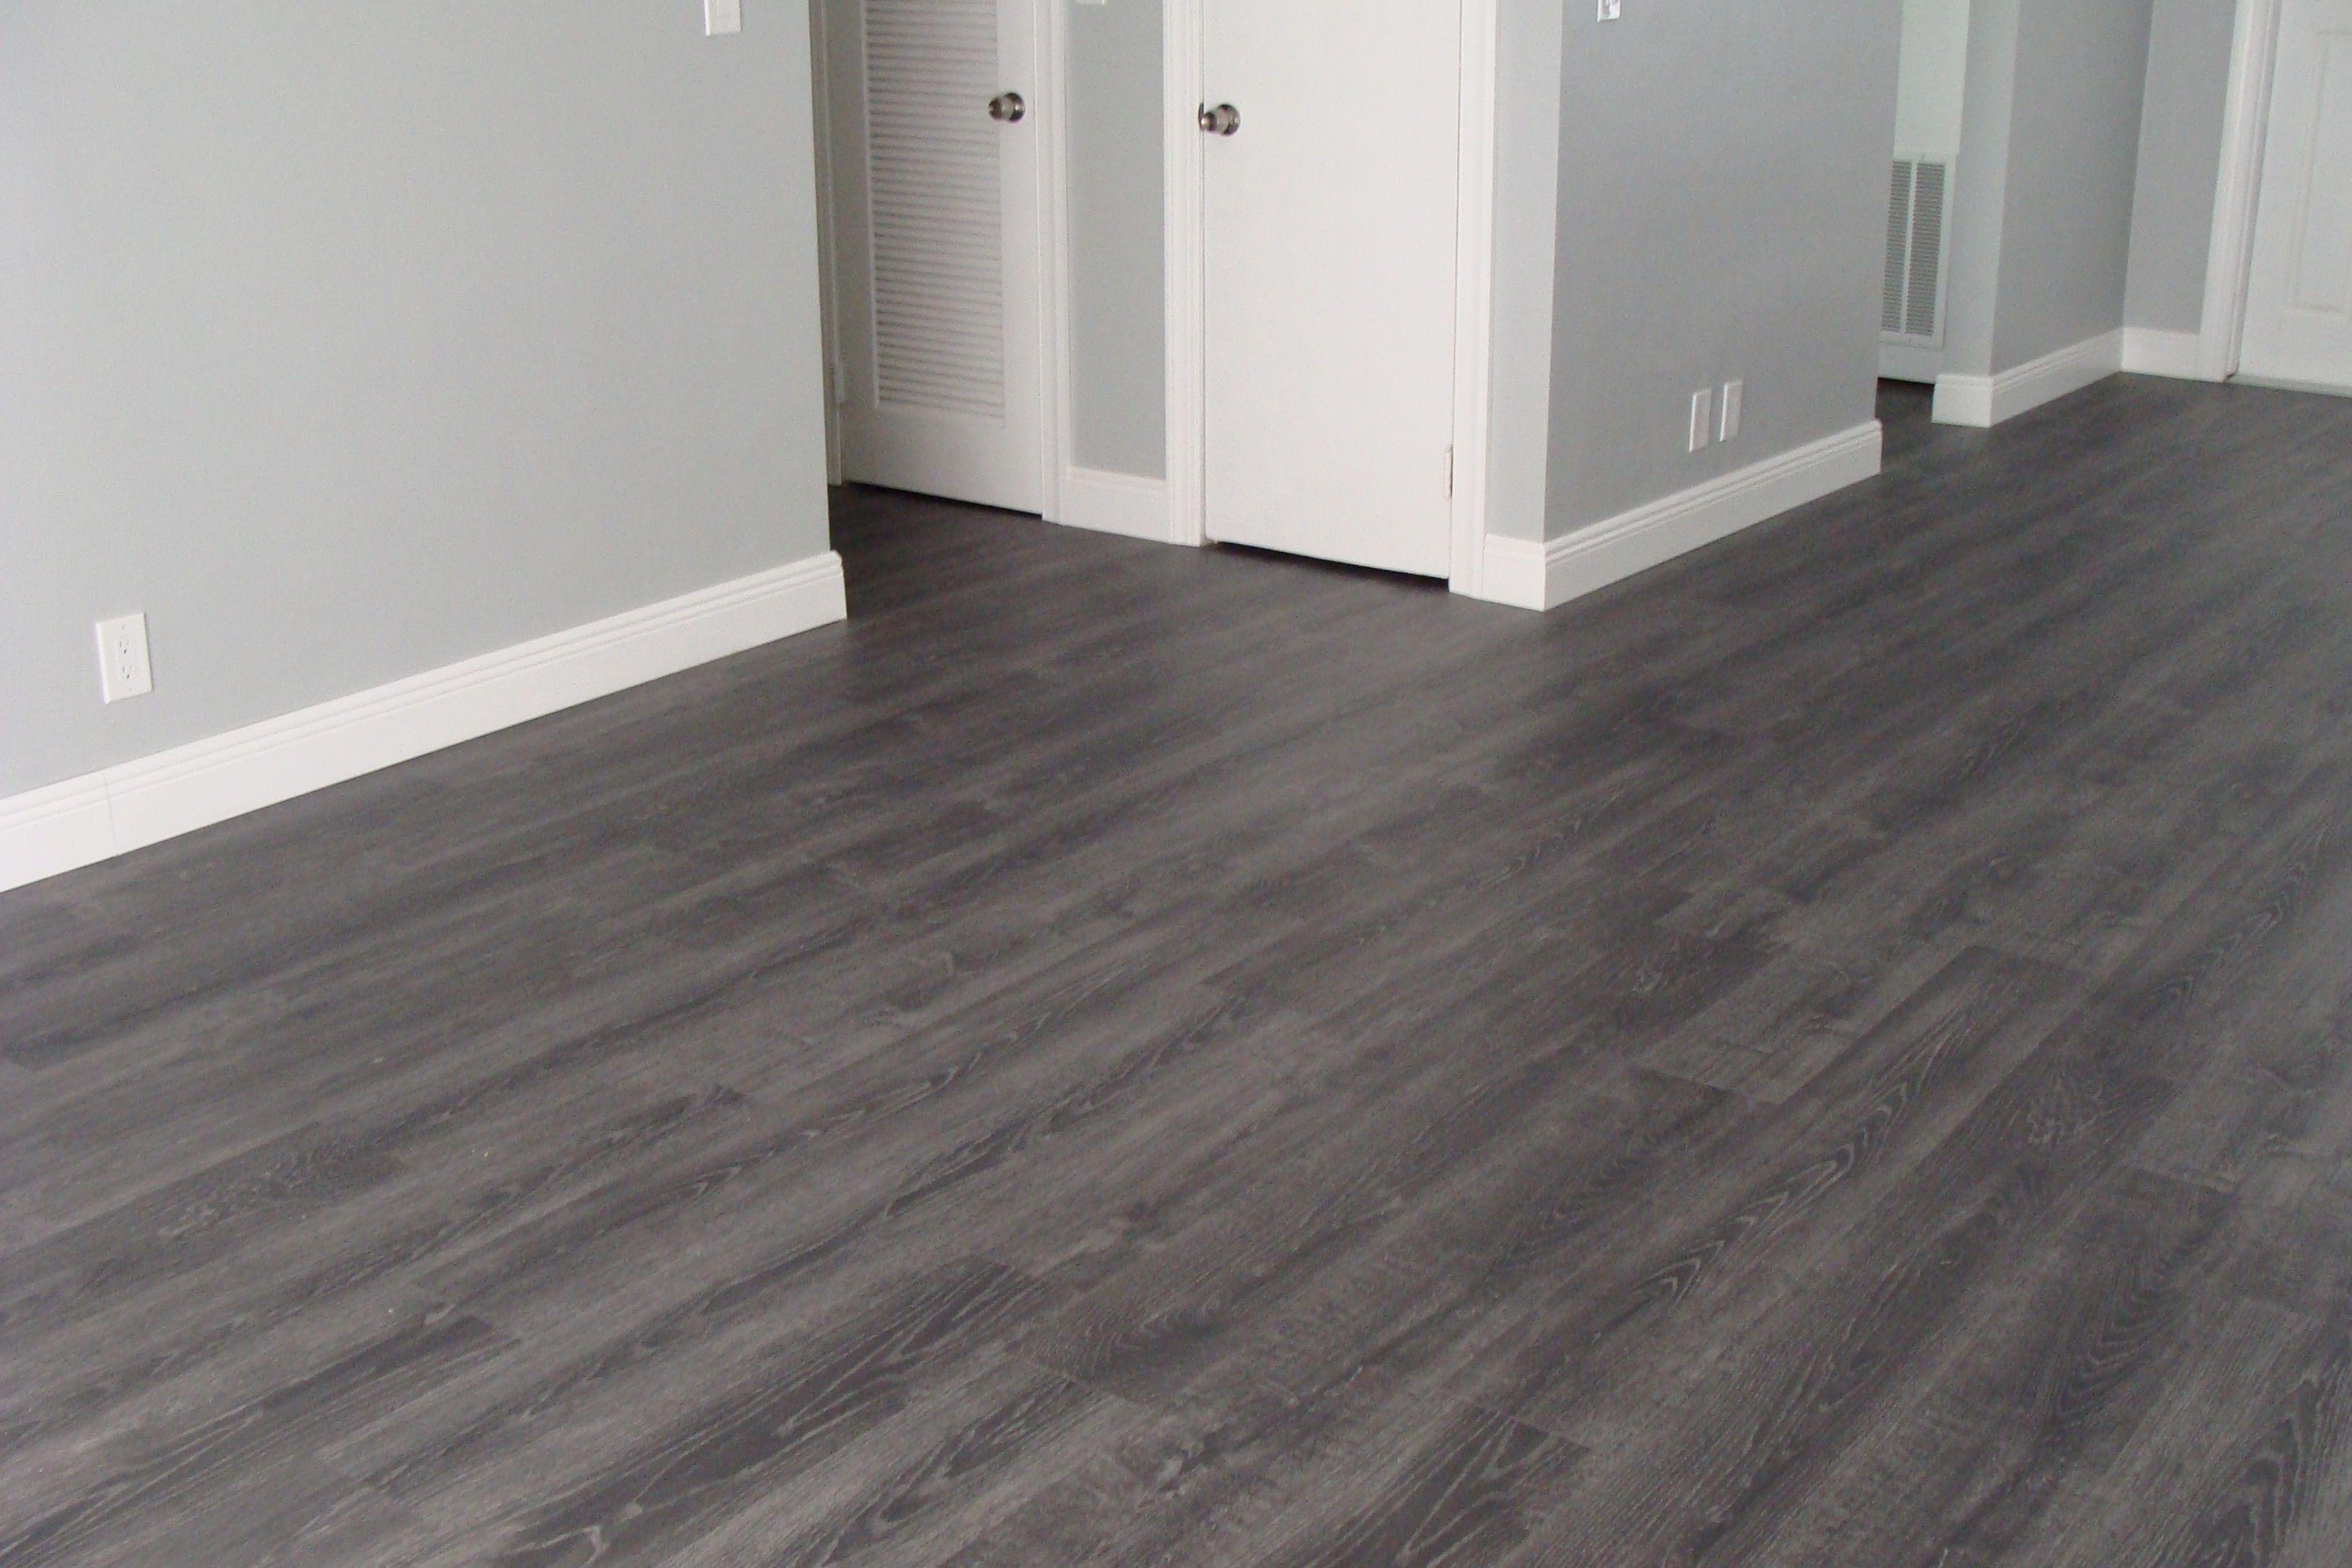 modern laminate flooring tokyo oak grey laminate (all rooms, minus the bathroom[s]). HKWUUAP